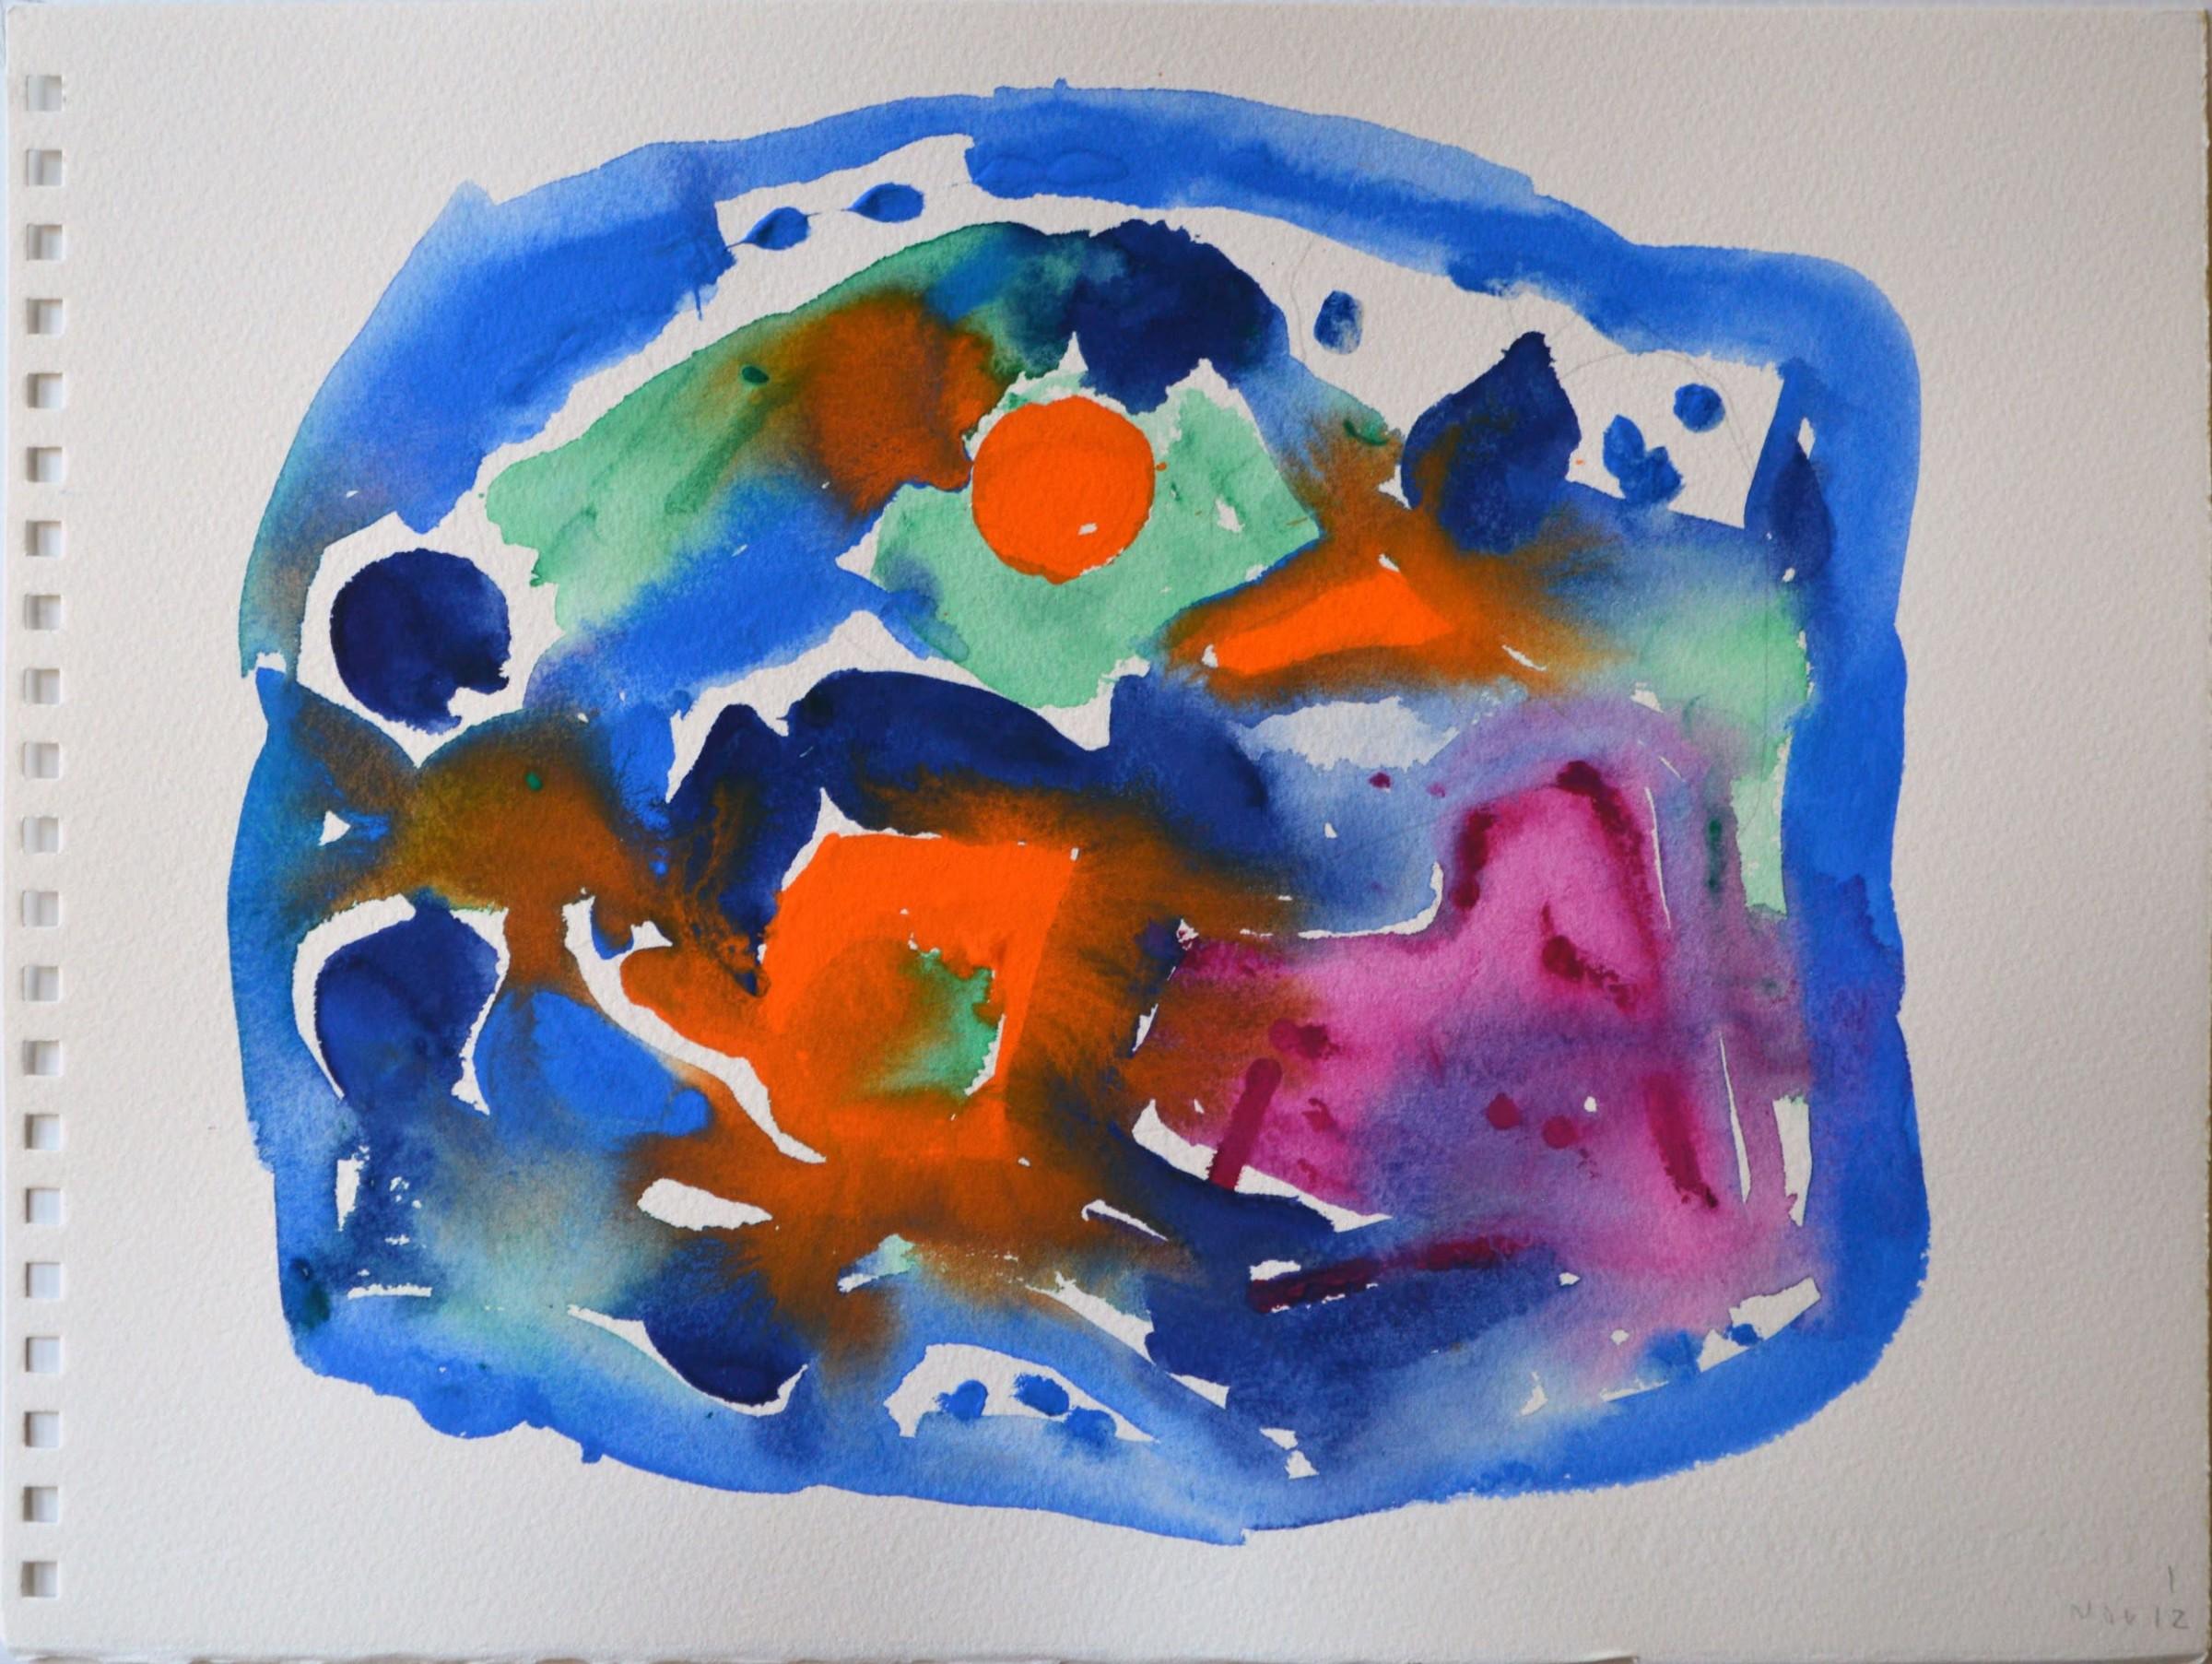 "<span class=""link fancybox-details-link""><a href=""/artists/32-james-faure-walker/works/12575-james-faure-walker-dunwich-work-book-no.2-nov-12-2020/"">View Detail Page</a></span><div class=""artist""><span class=""artist""><strong>James Faure Walker</strong></span></div><div class=""title""><em>Dunwich Work Book, No.2, Nov 12, 2020</em></div><div class=""medium"">gouache</div><div class=""dimensions"">Artwork: 38 x 28cm</div><div class=""price"">£450.00</div>"